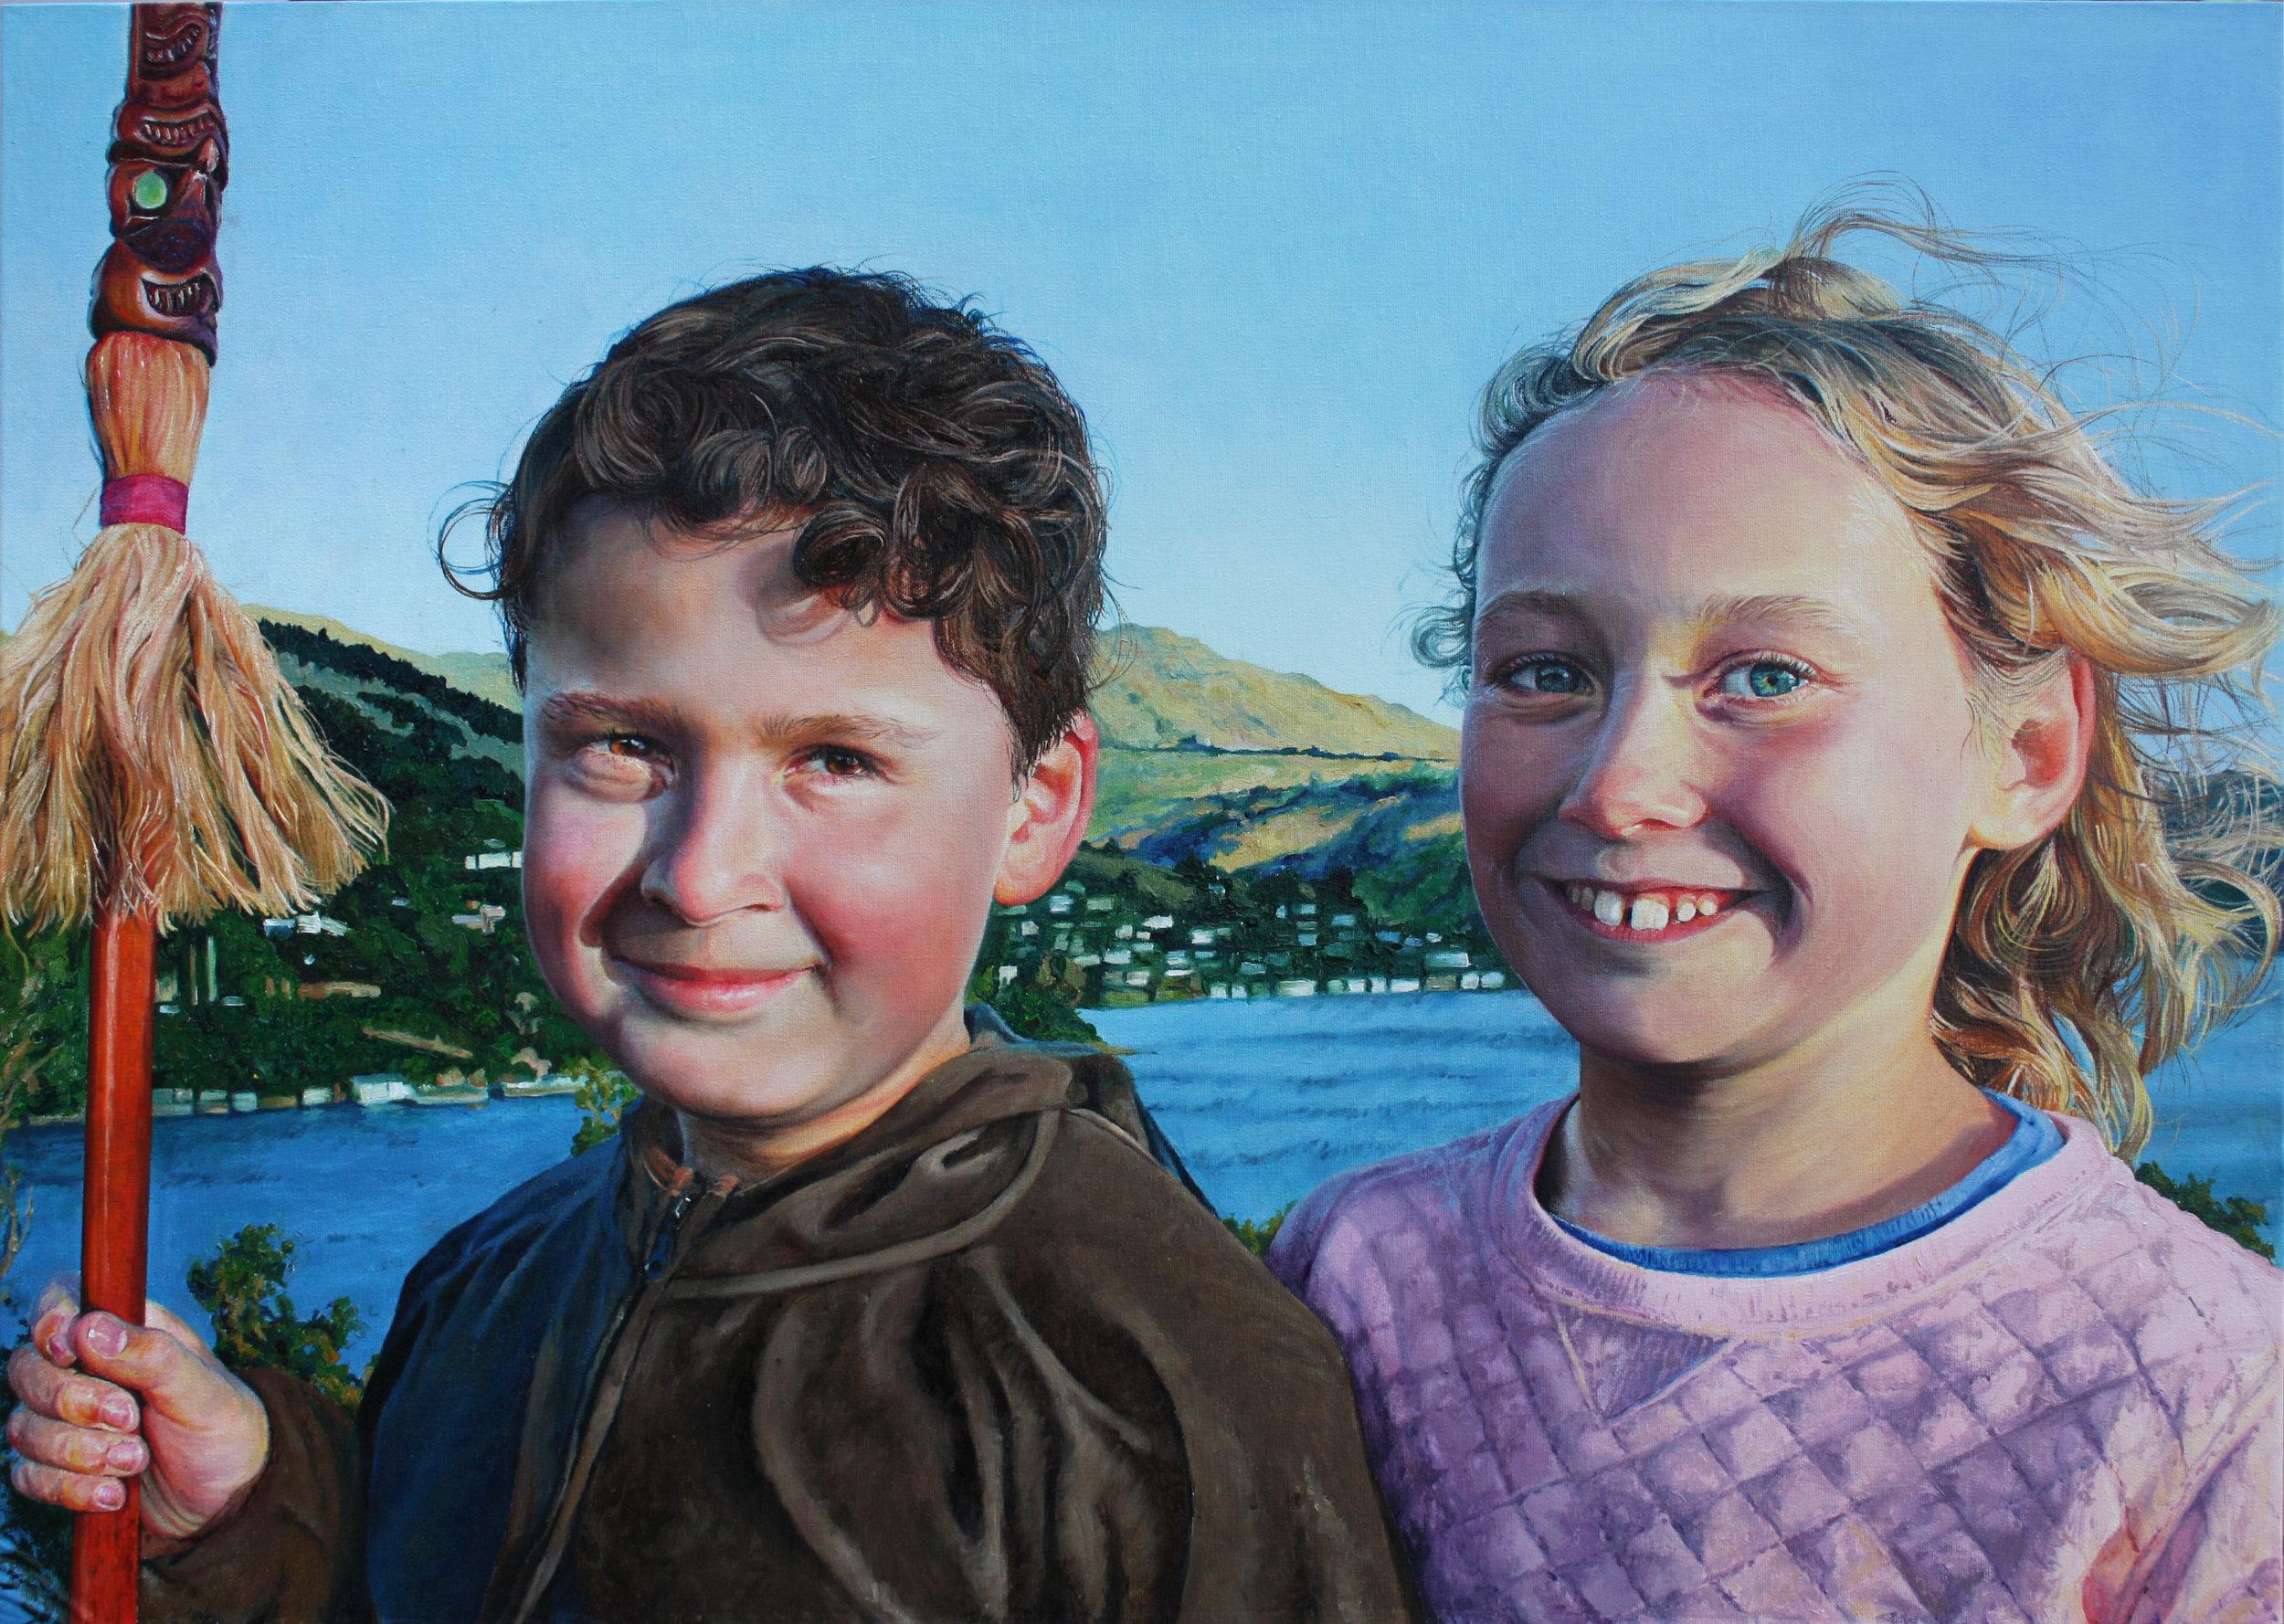 'Our Future'   60 x 80cm- Oil on Canvas Finalist - Bridget Baldwin